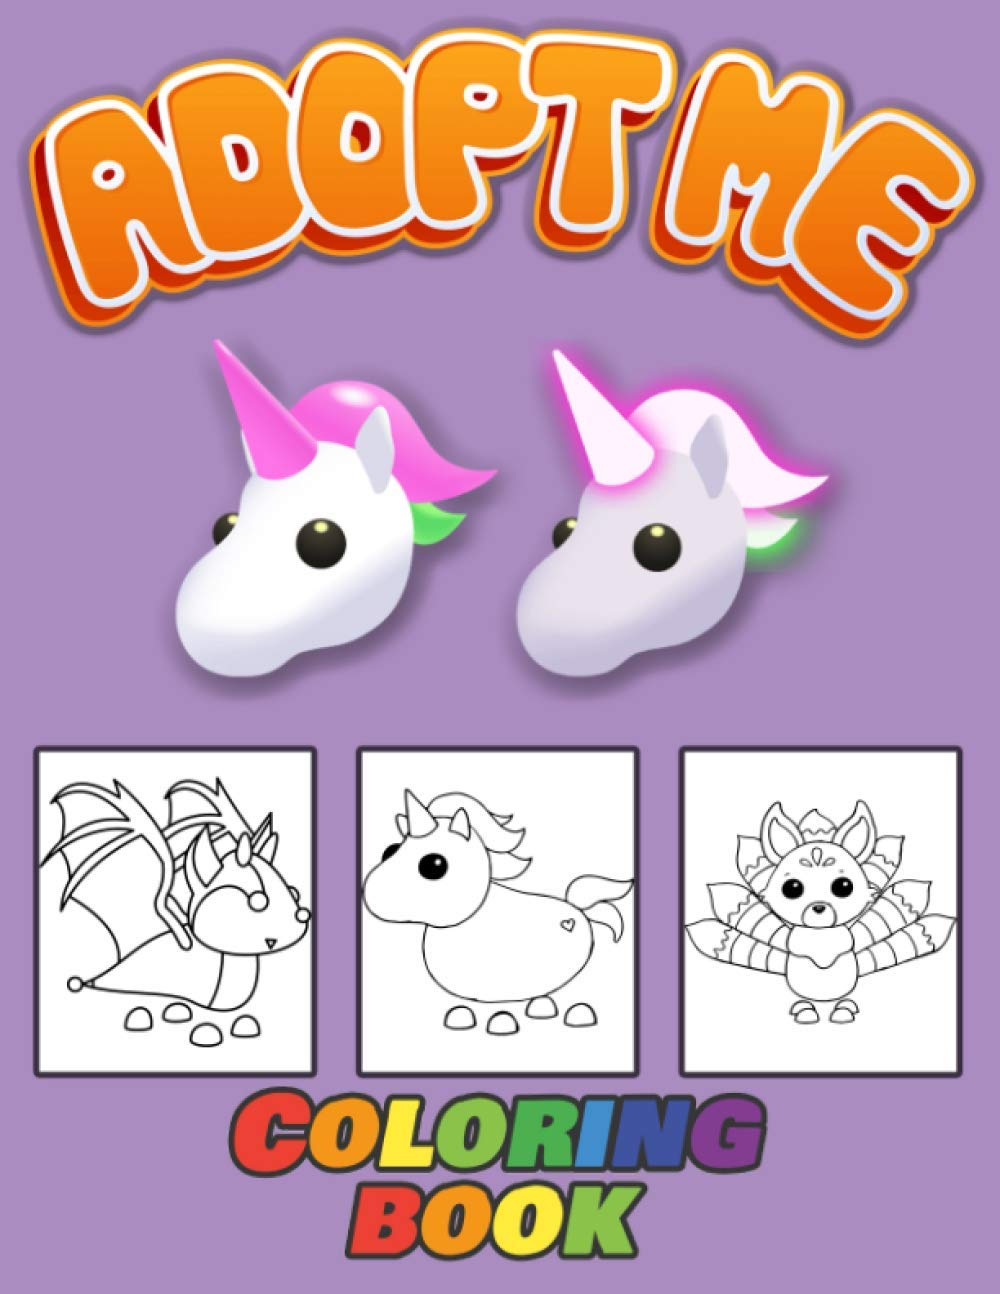 Adopt Me Coloring Book Exclusive Adopt Me Roblox Coloring Book ...